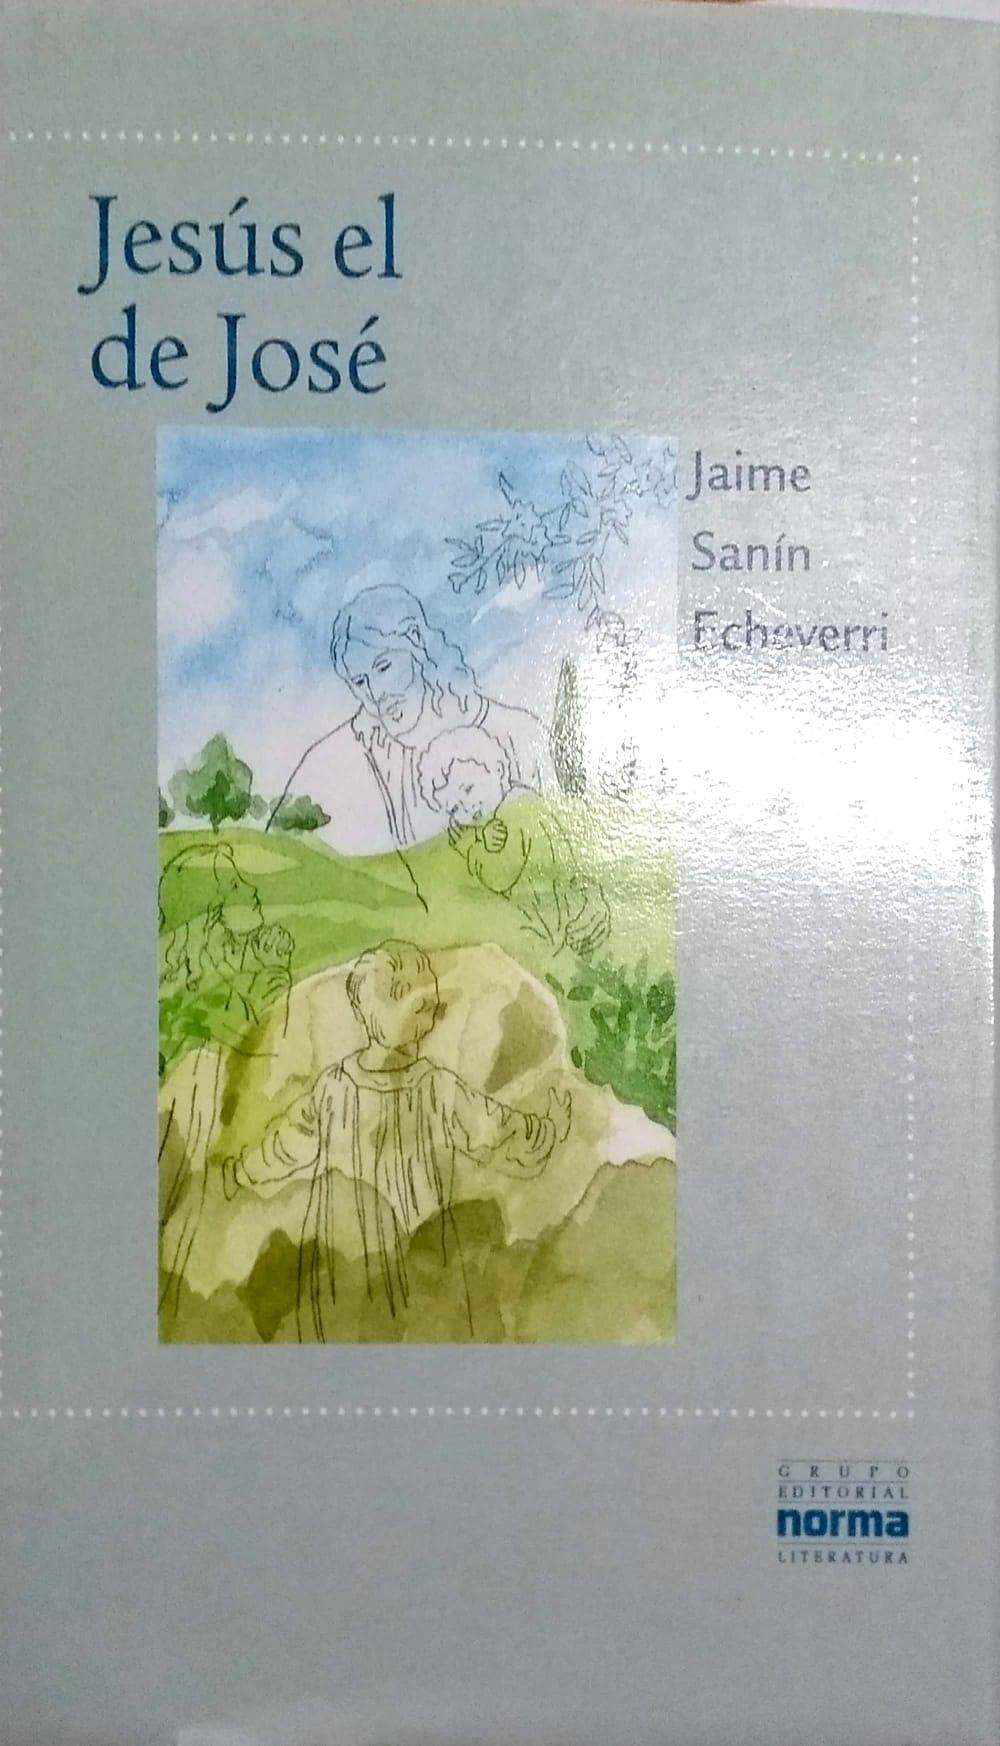 JESUS EL DE JOSE - JAIME SANIN ECHEVERRI